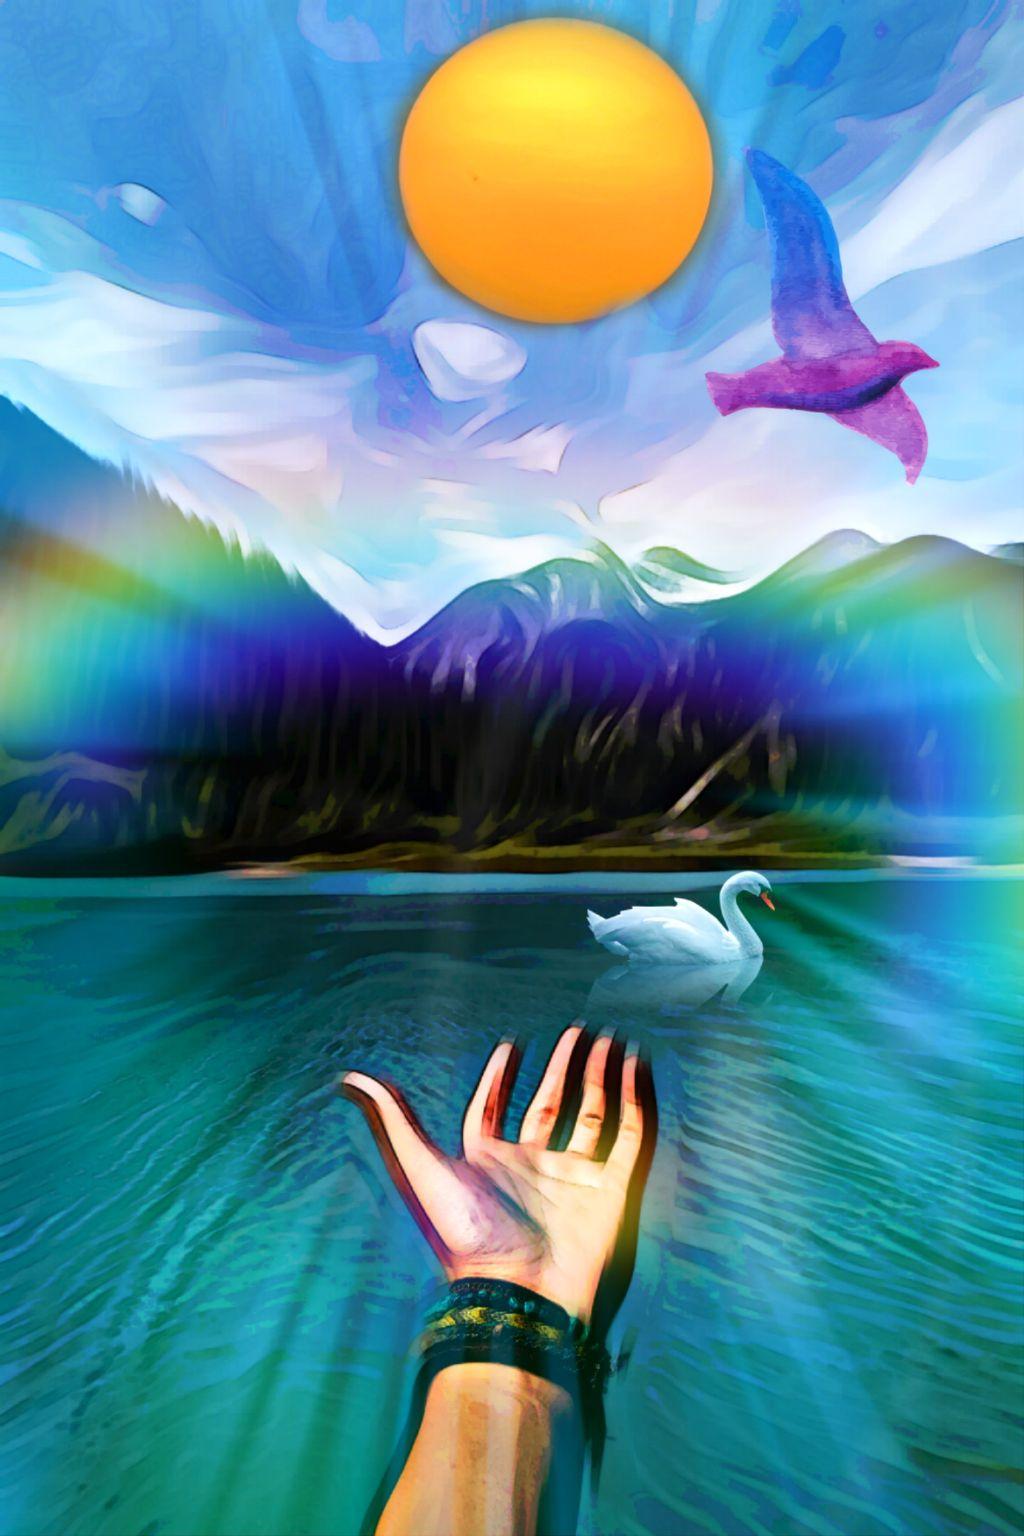 #freetoedit #nature #landscape #oilpaintingeffect #watercoloreffect #masklight  #stickerart #adjusttools #rainbowbrush #myedit #madewithpicsart #irccaptivatinglybeautiful